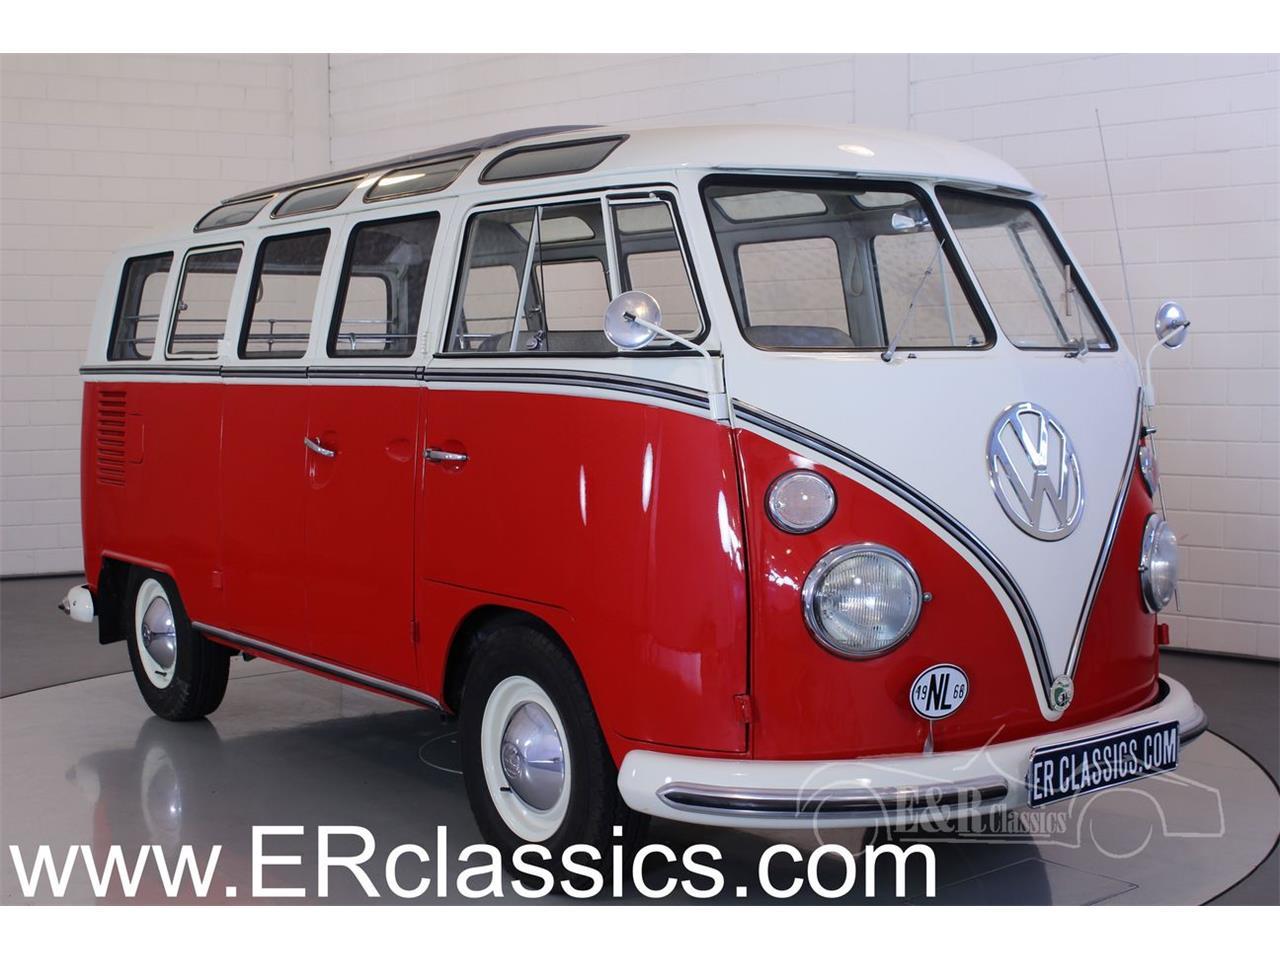 Large Picture of 1966 Volkswagen Bus located in Waalwijk Noord-Brabant - $121,650.00 - O9OE